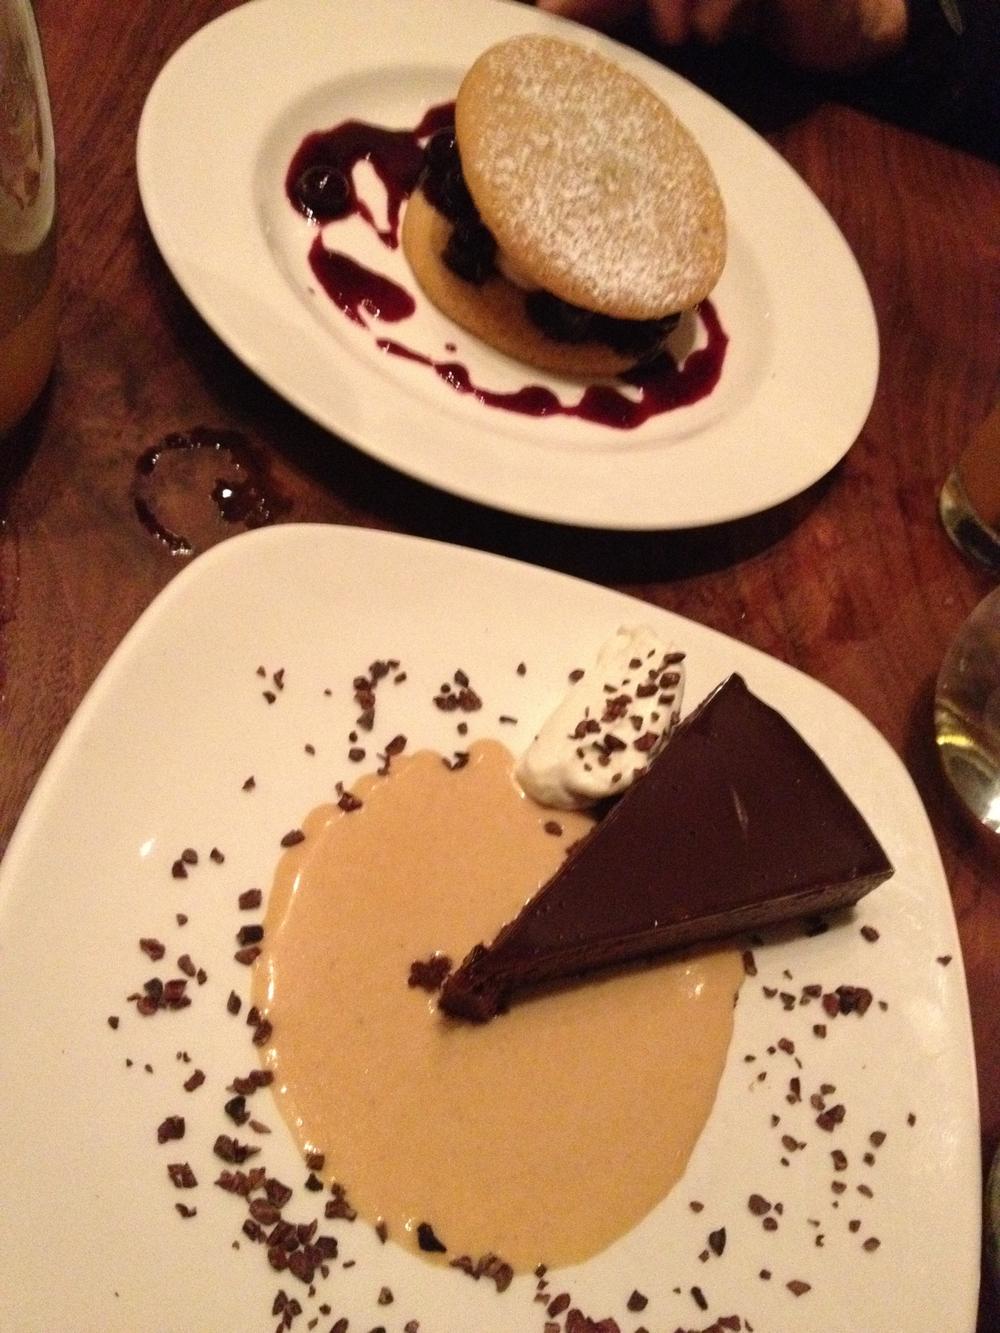 Peach Ice Cream Sandwich & Flourless Chocolate Torte